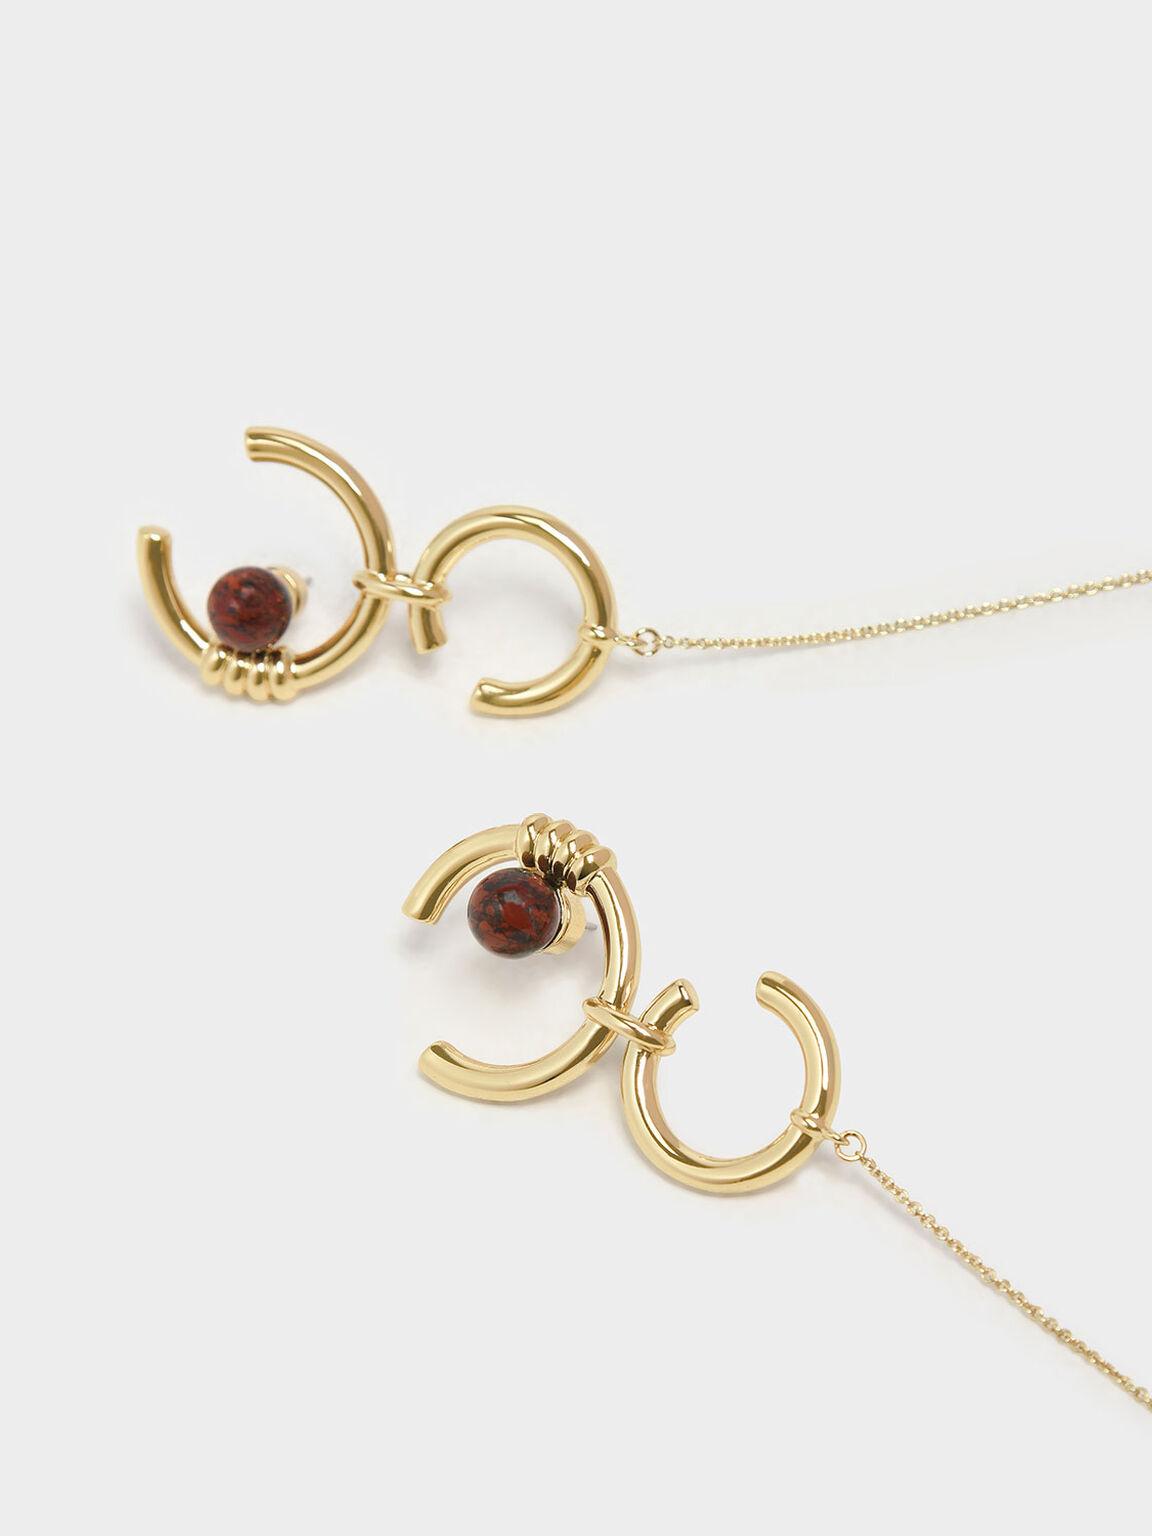 Jasper Stone Chain Link Earrings, Gold, hi-res